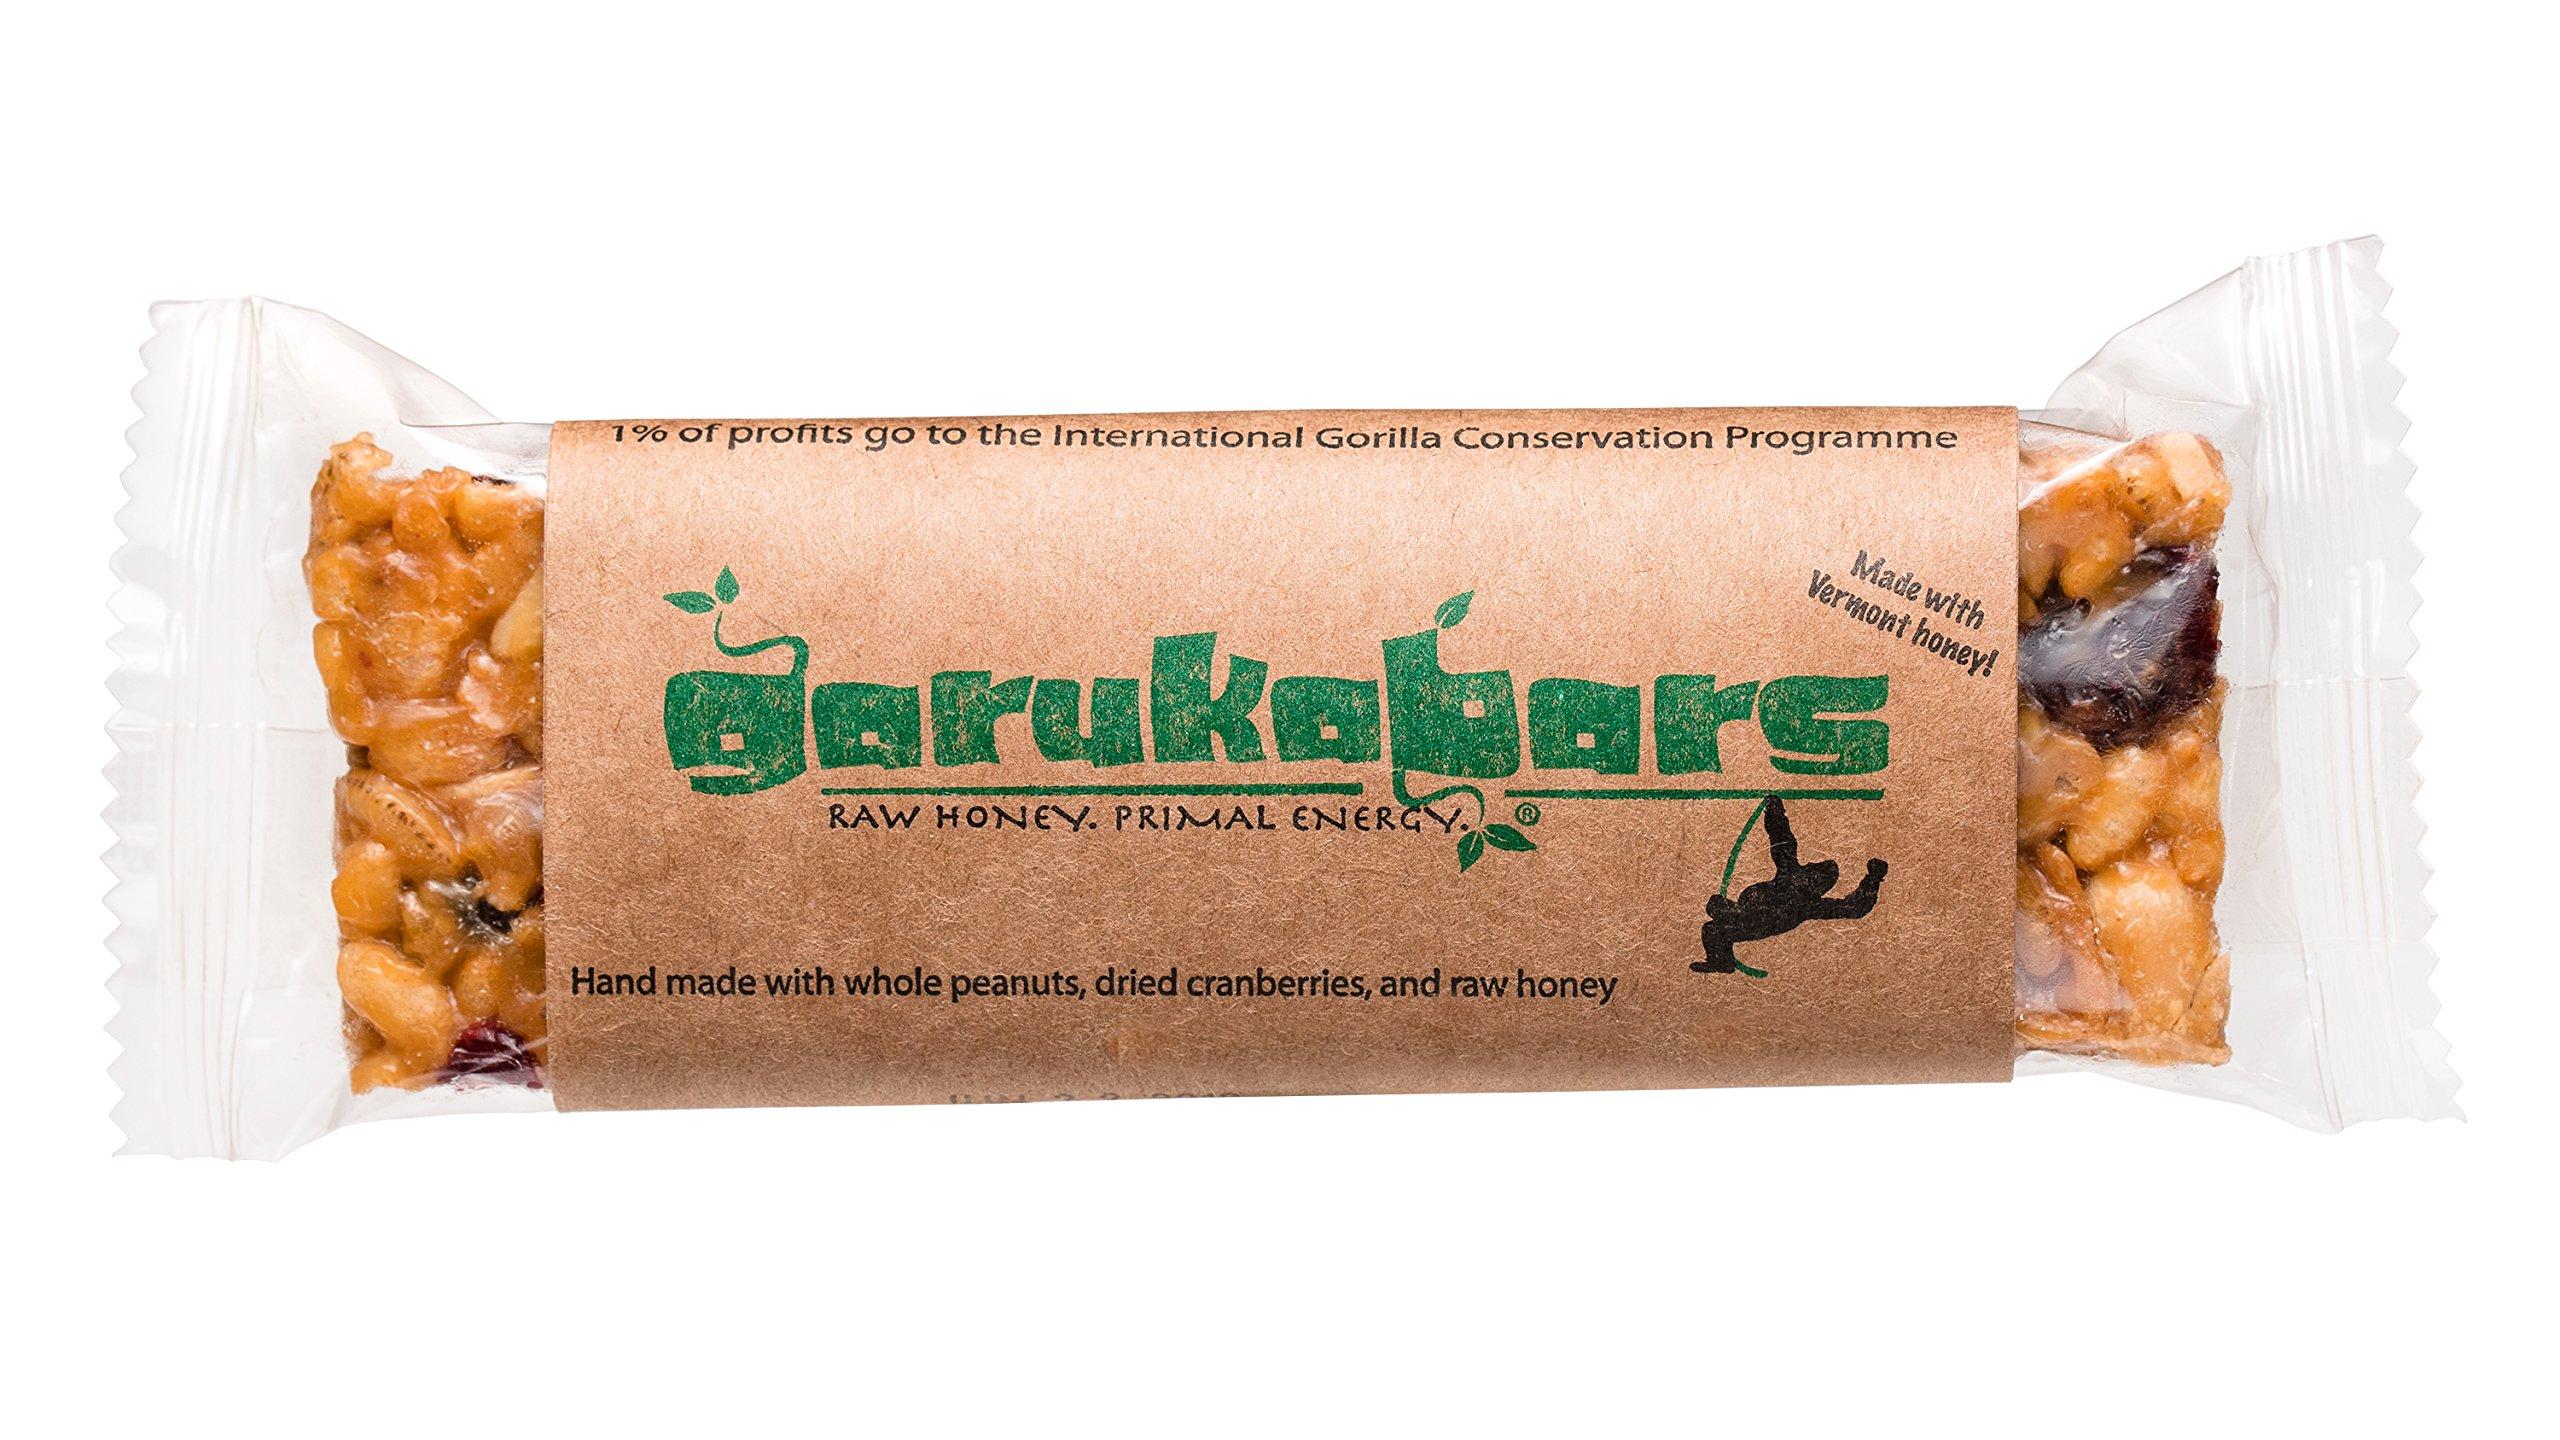 Garuka Bars Energy Bar - Handmade with Raw Honey - 100% Recyclable Packaging - 20 Pack